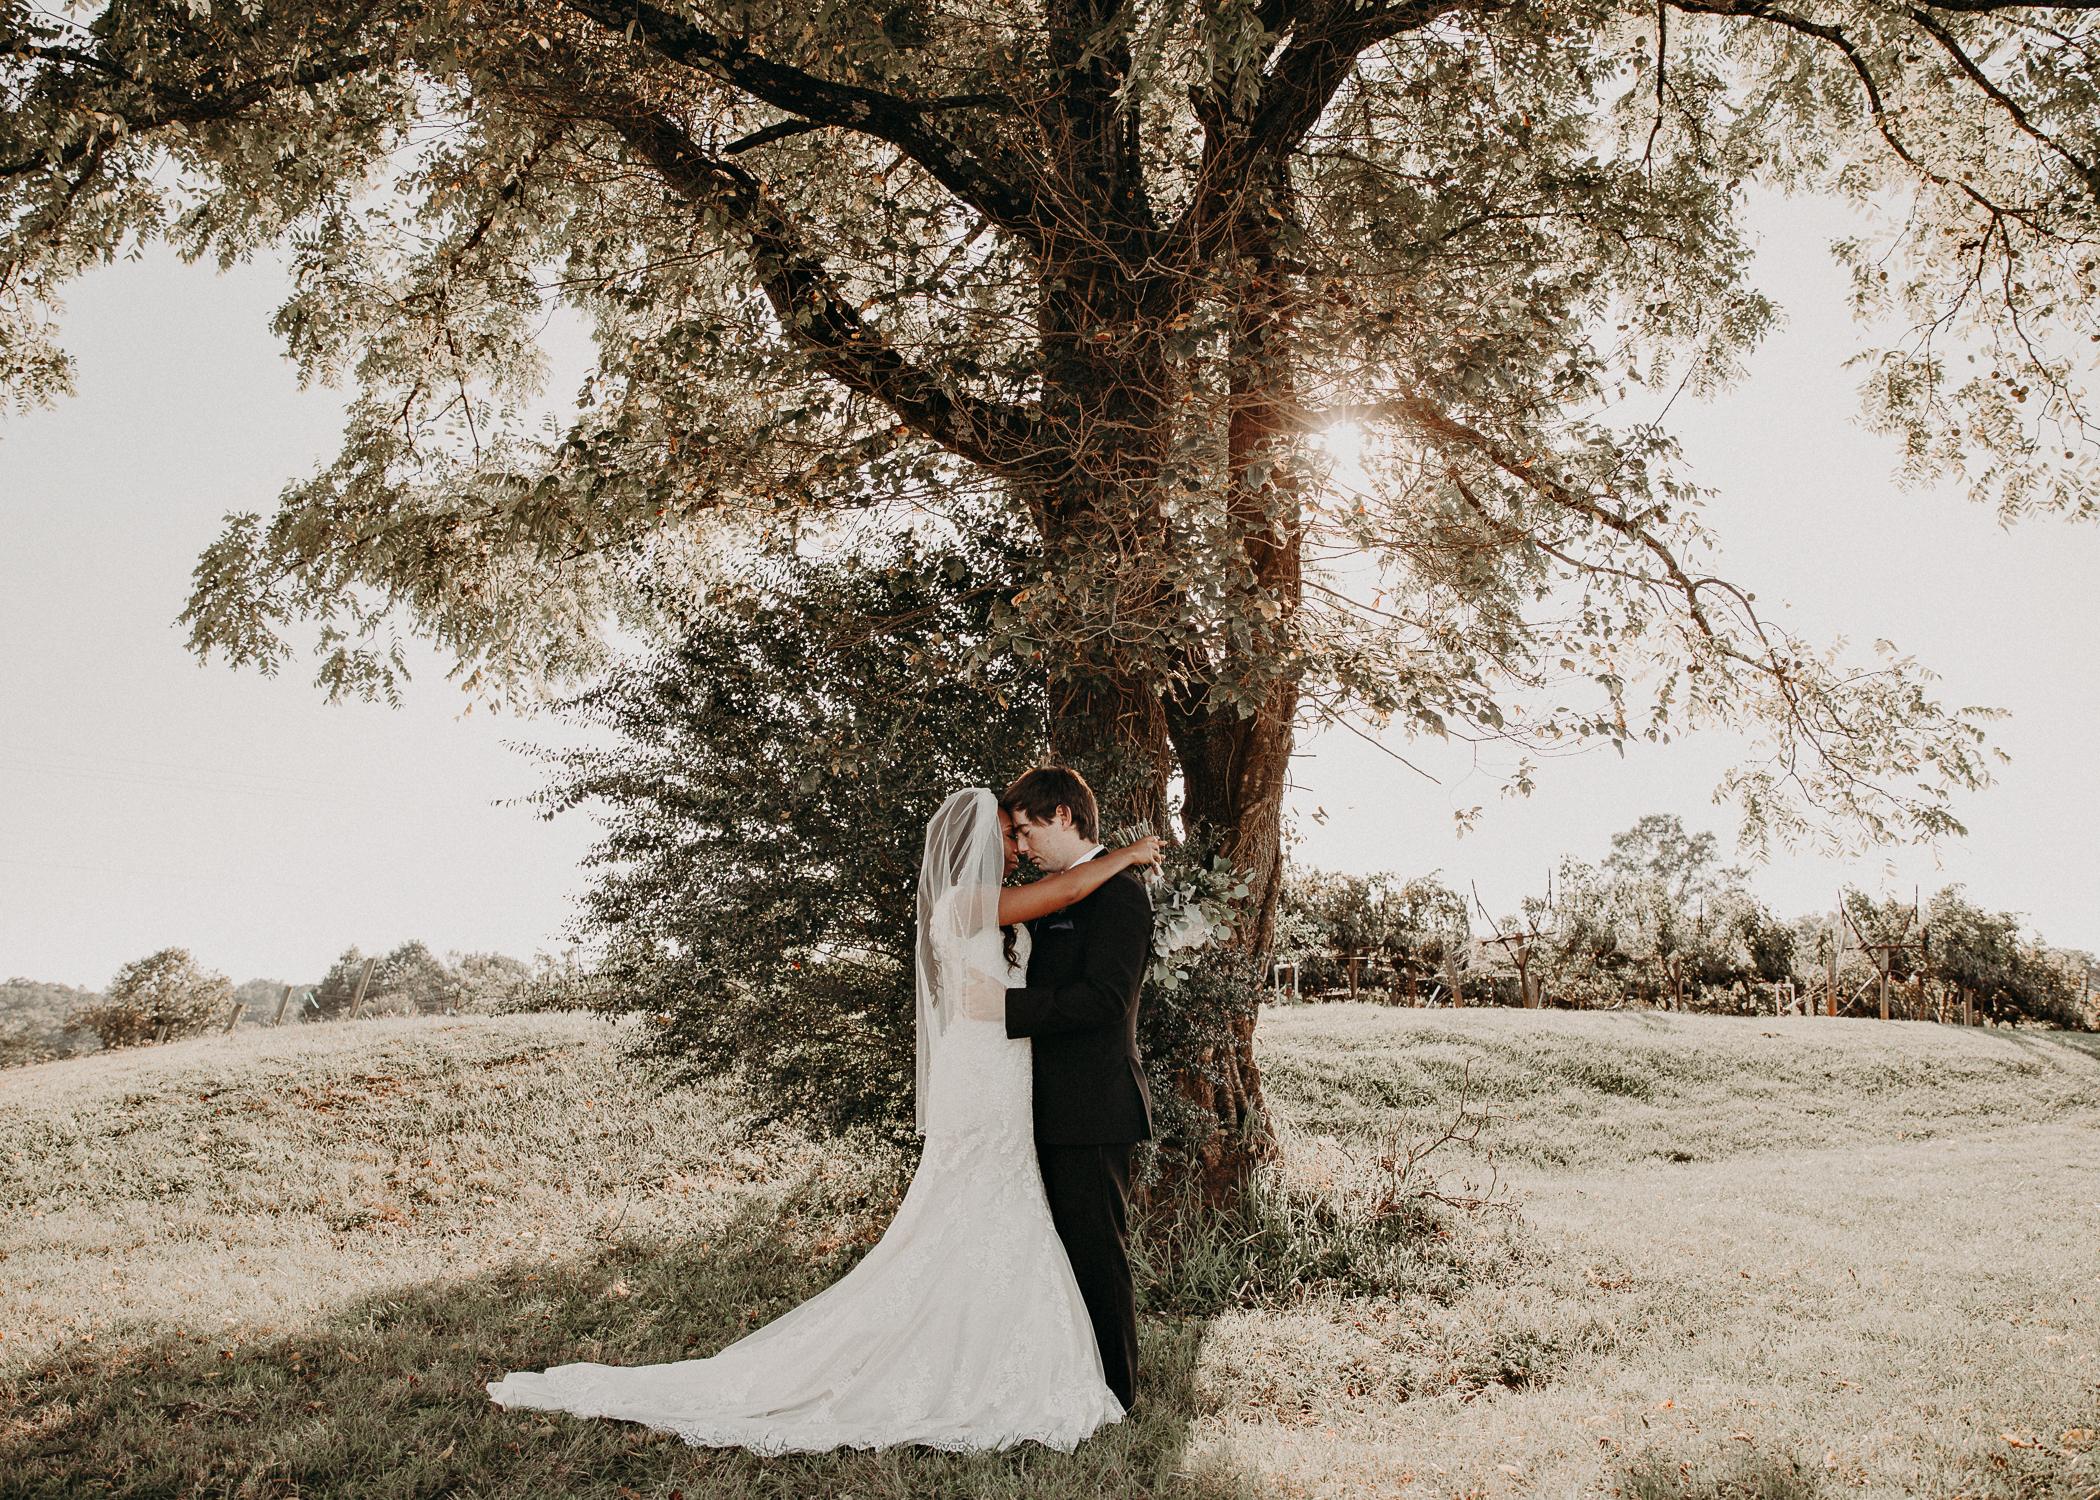 40- Kaya_vineards_wedding_venue_Bride_and_groom_first_look_and_portraits_aline_marin_photography.jpg